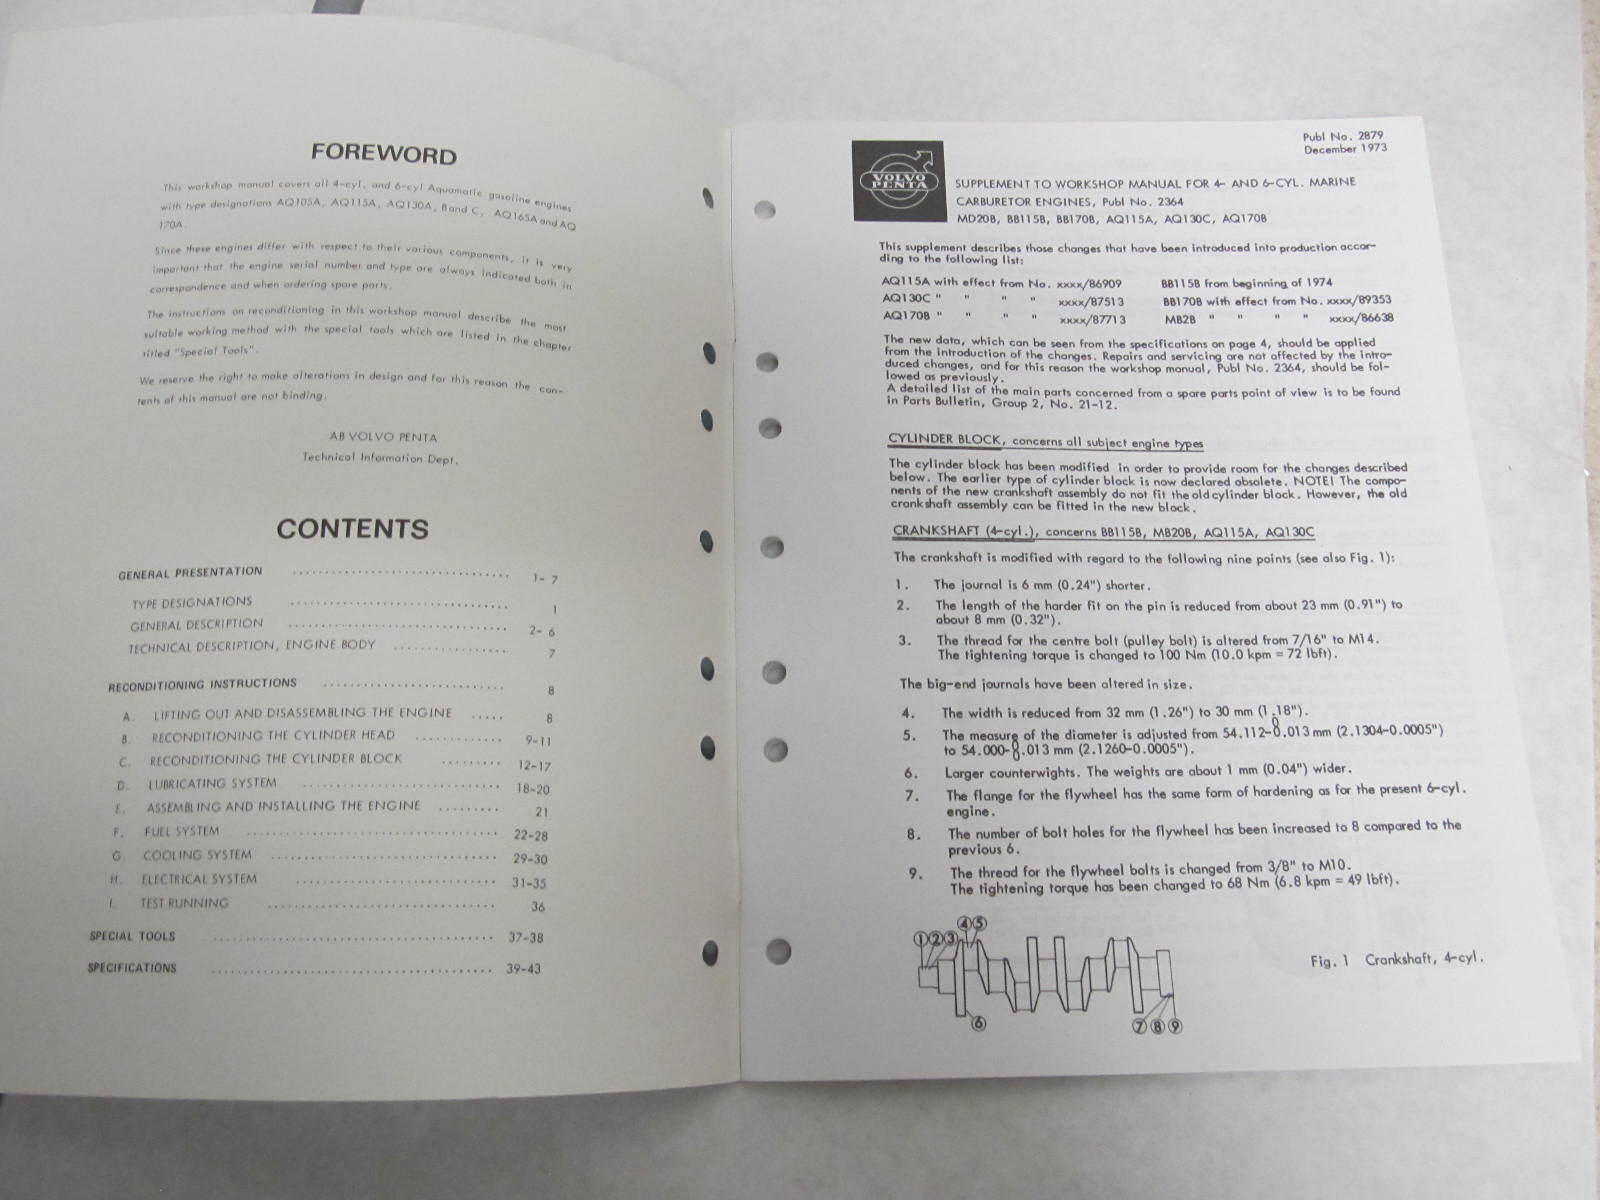 7723640 4 1970 73 volvo penta aquamatic service workshop Volvo Penta Shop Manual Volvo Penta Shop Manual